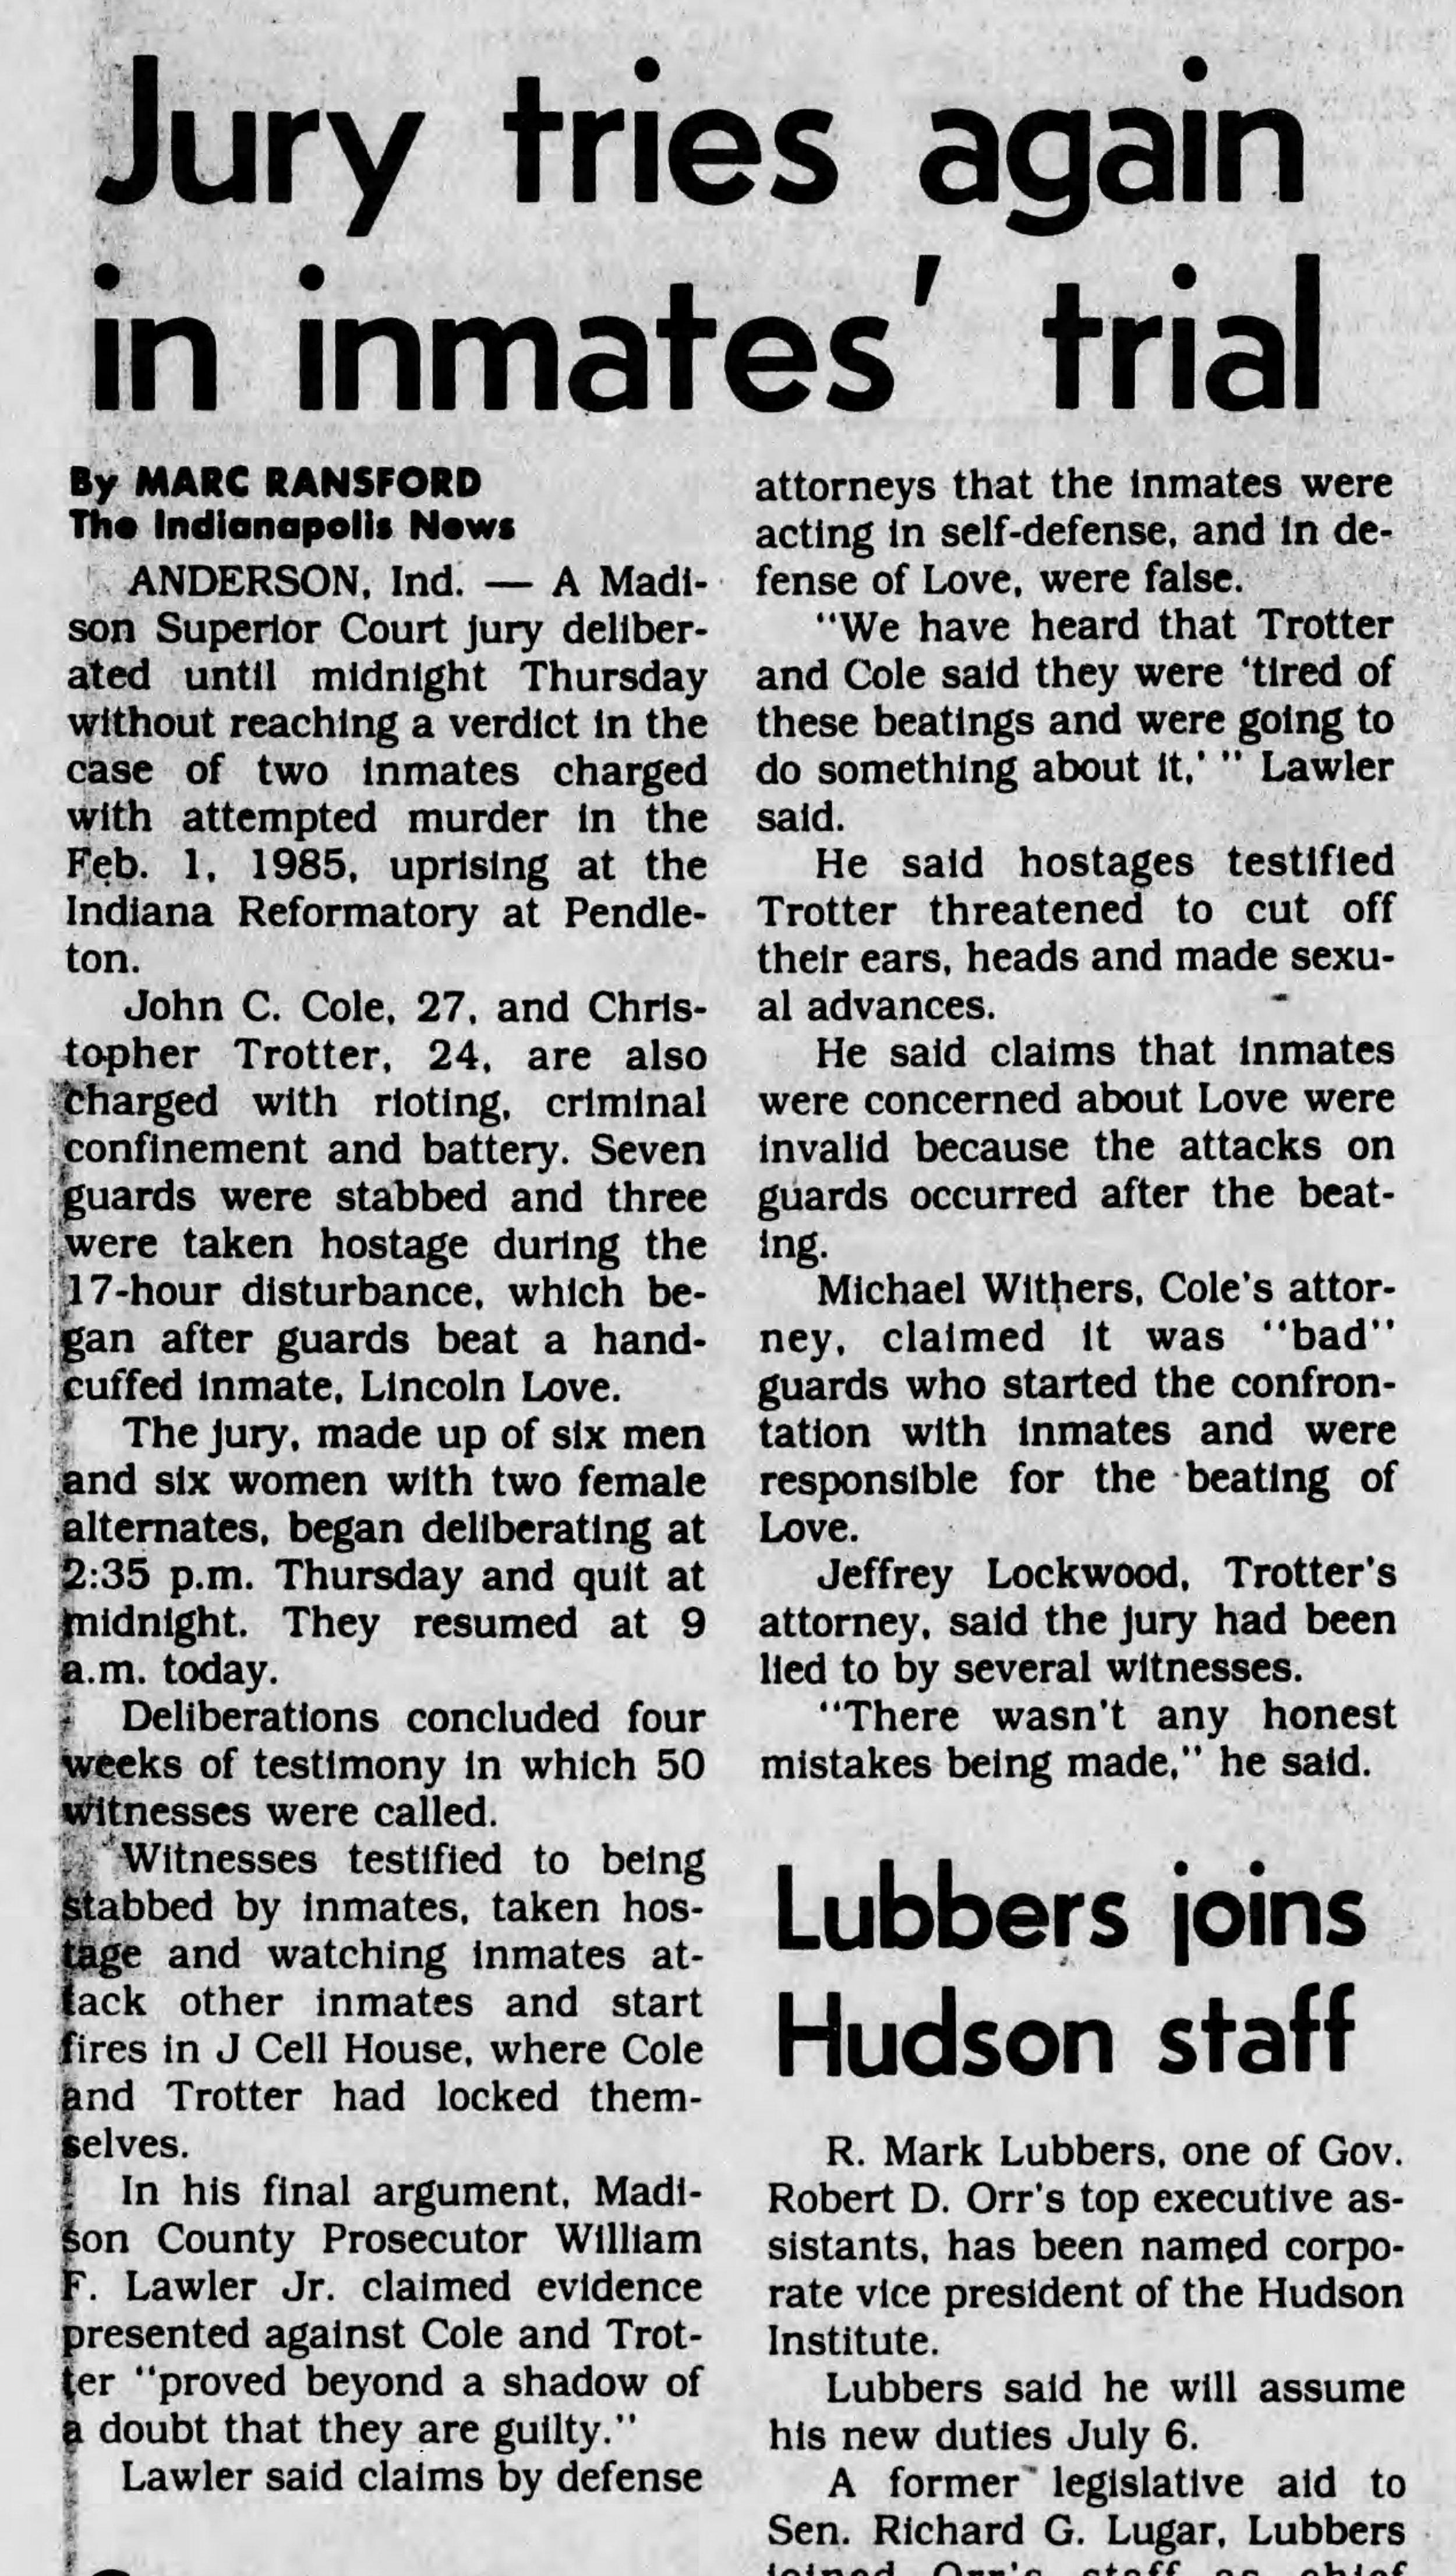 The_Indianapolis_News_Fri__Jun_12__1987_.jpg